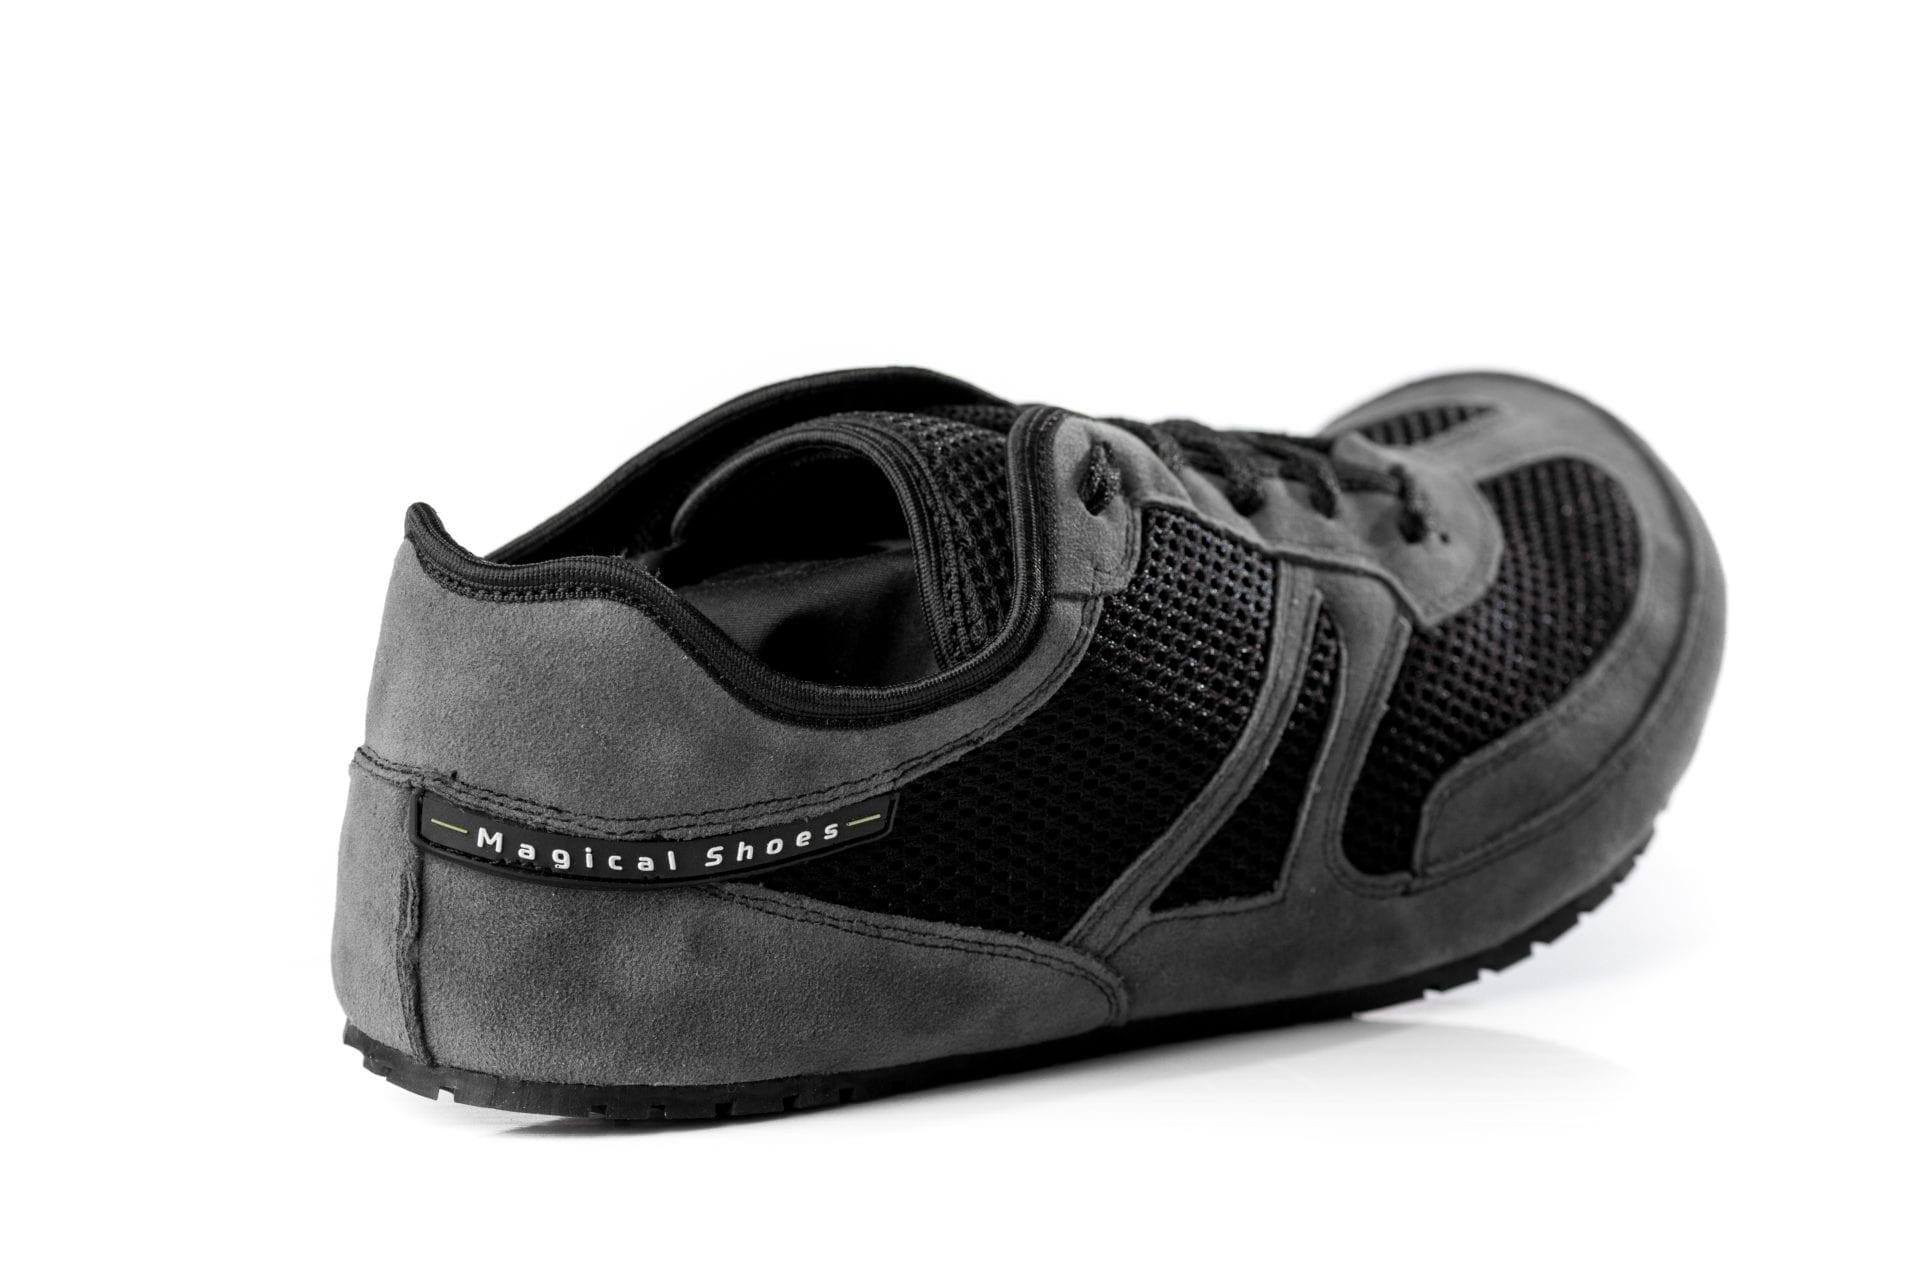 Magical Shoes BAREFOOT SHOES EXPLORER VEGAN GRAY KIDS picture 2